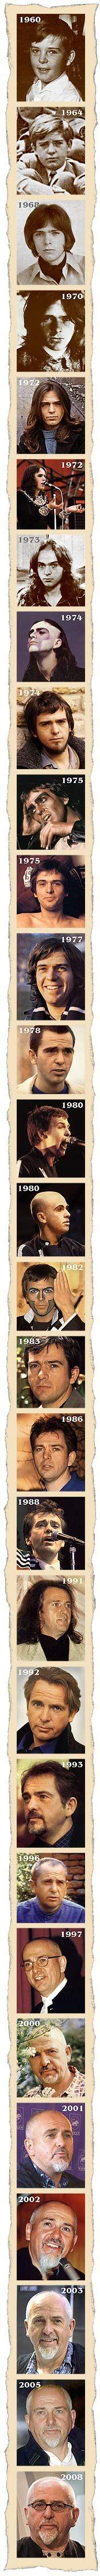 More Peter Gabriel